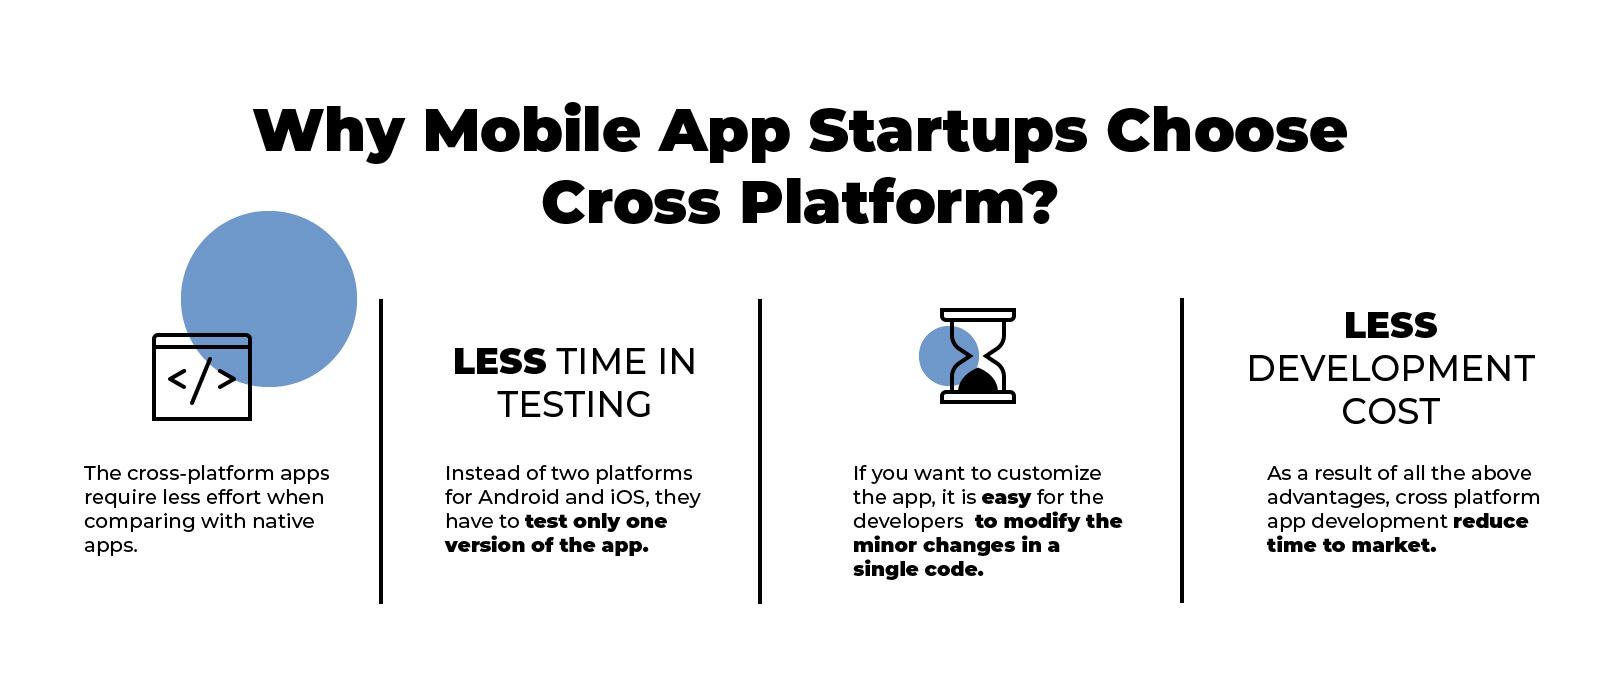 cross platform app development, flutter app development, mobile app startup choose flutter for cross platform framework, agiletech